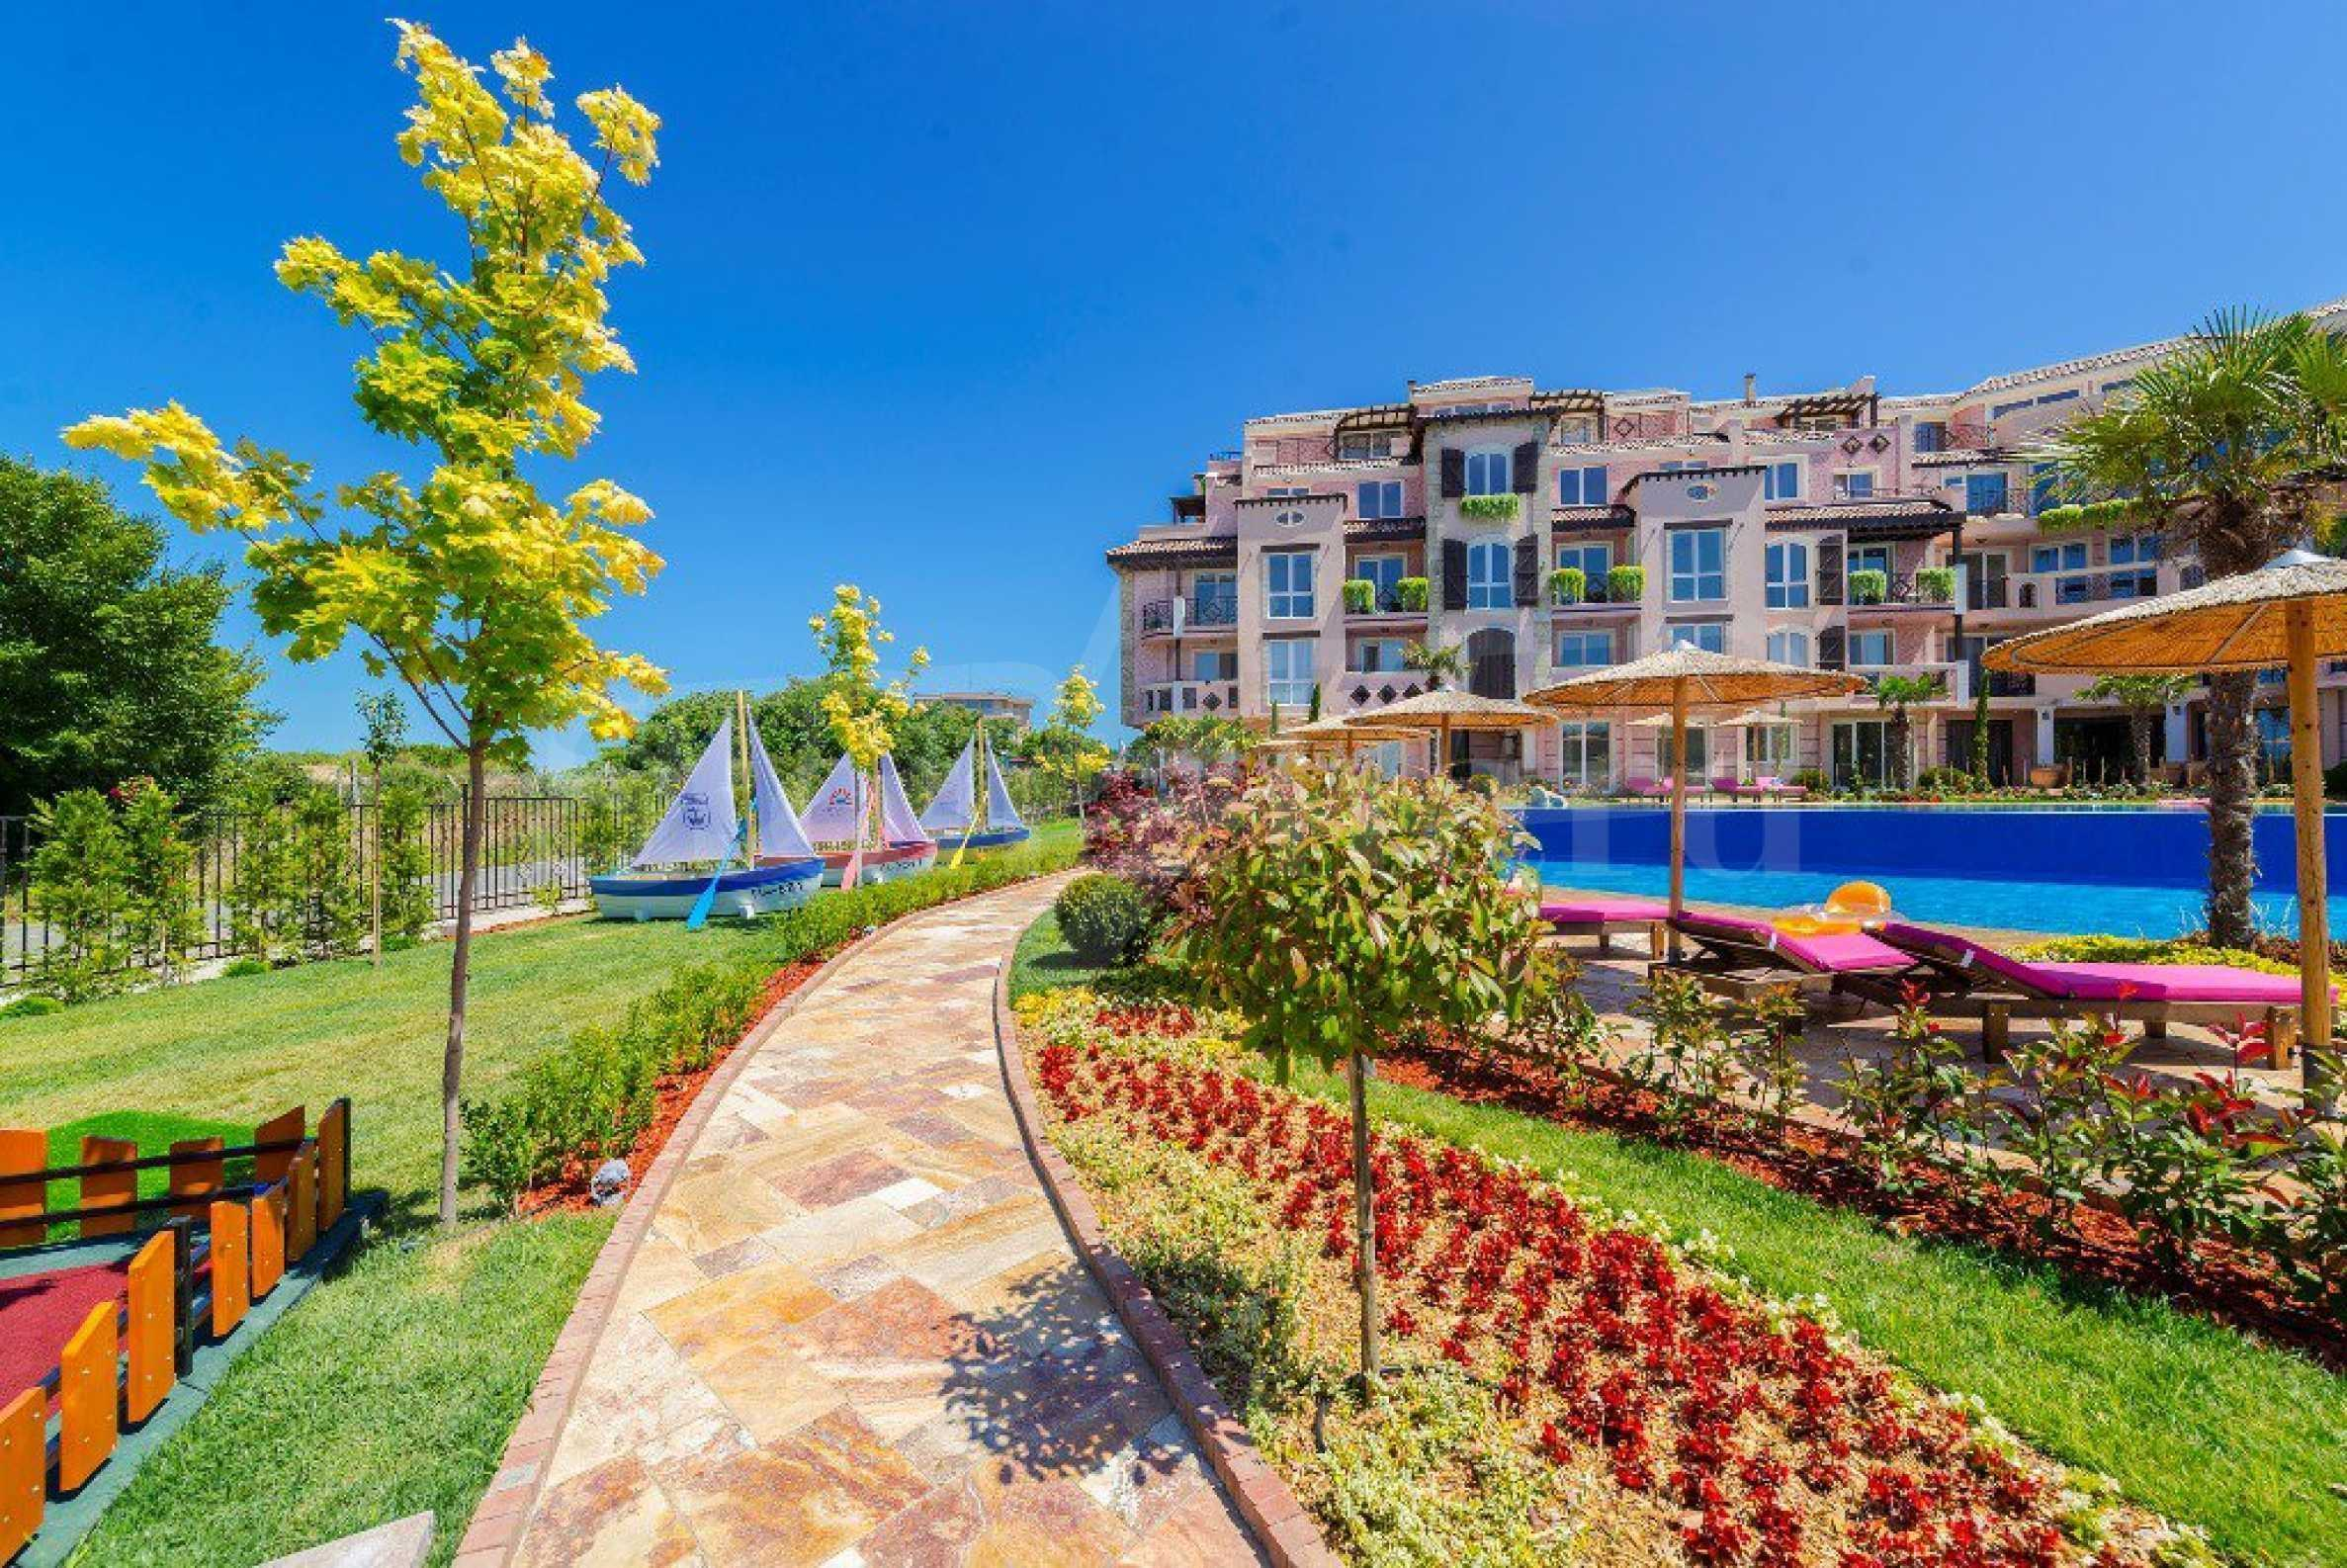 New 1-bedroom apartment in a coastal complex by the Kavatsite Beach (Sozopol) 7